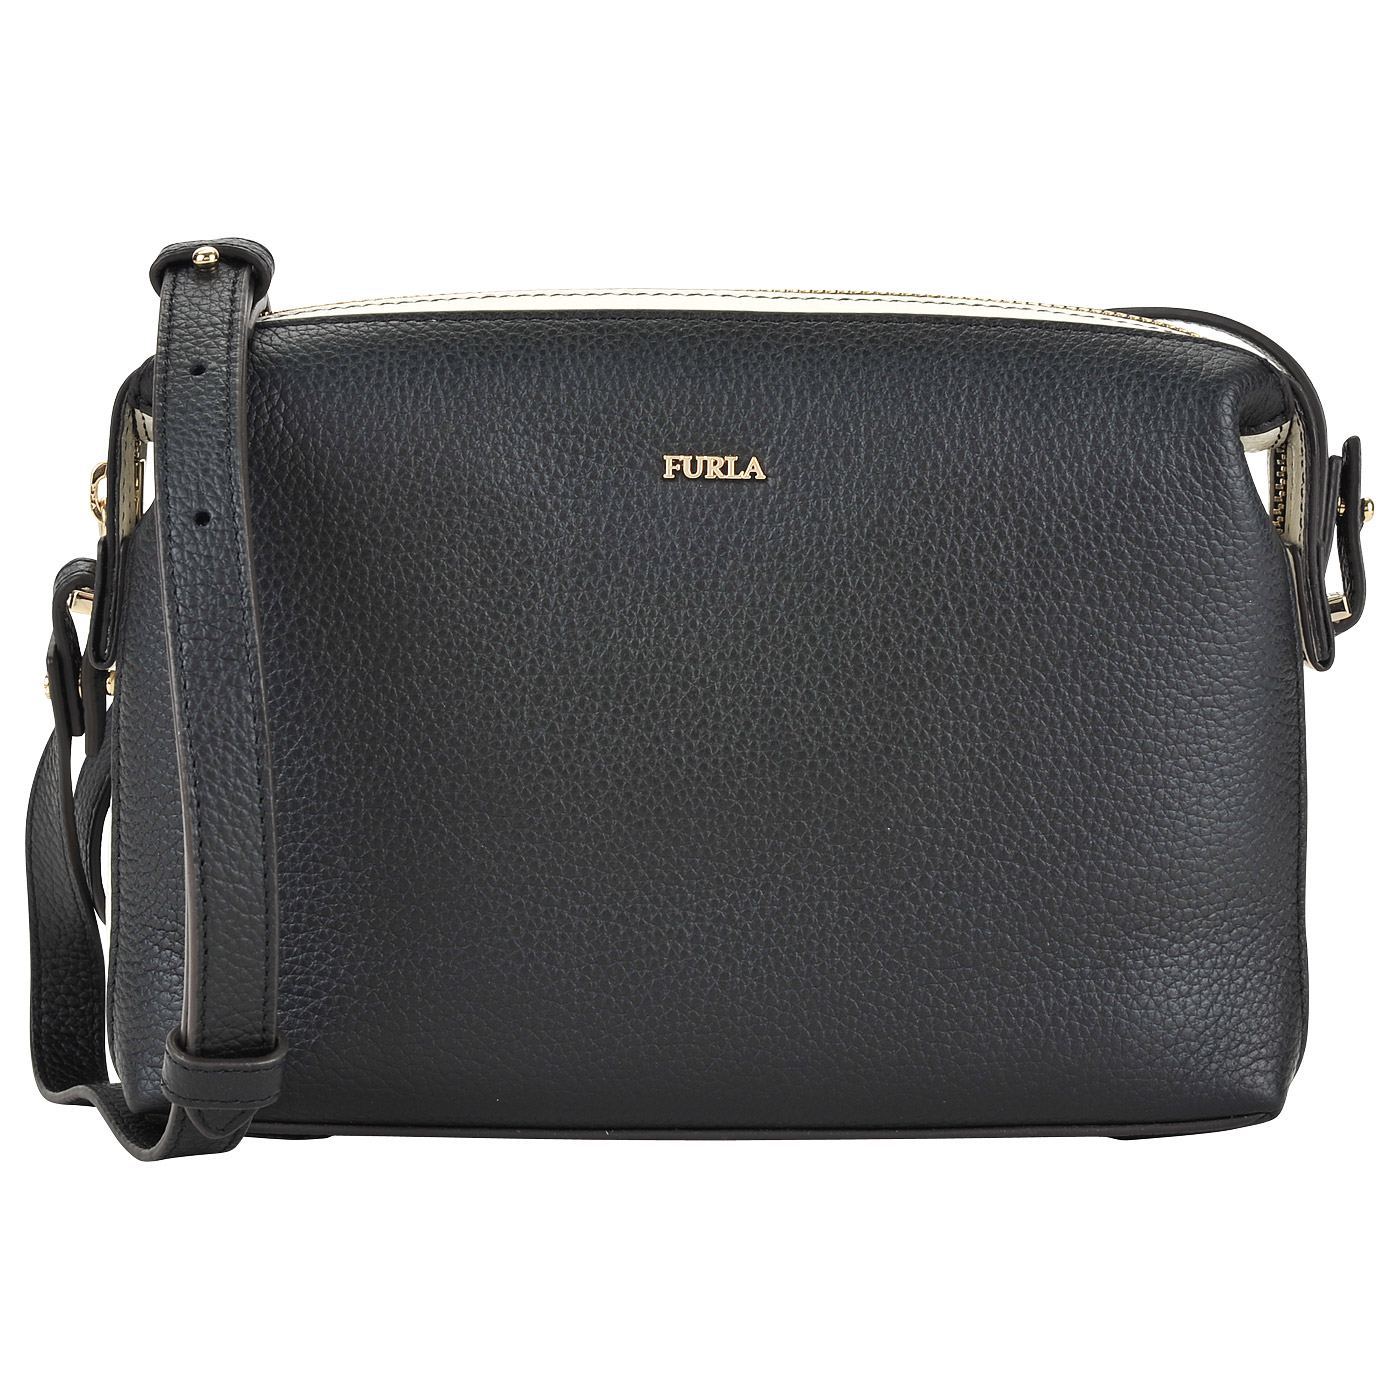 61970a85c0e7 Маленькая кожаная сумка через плечо Furla Blogger EP22_onyx ...